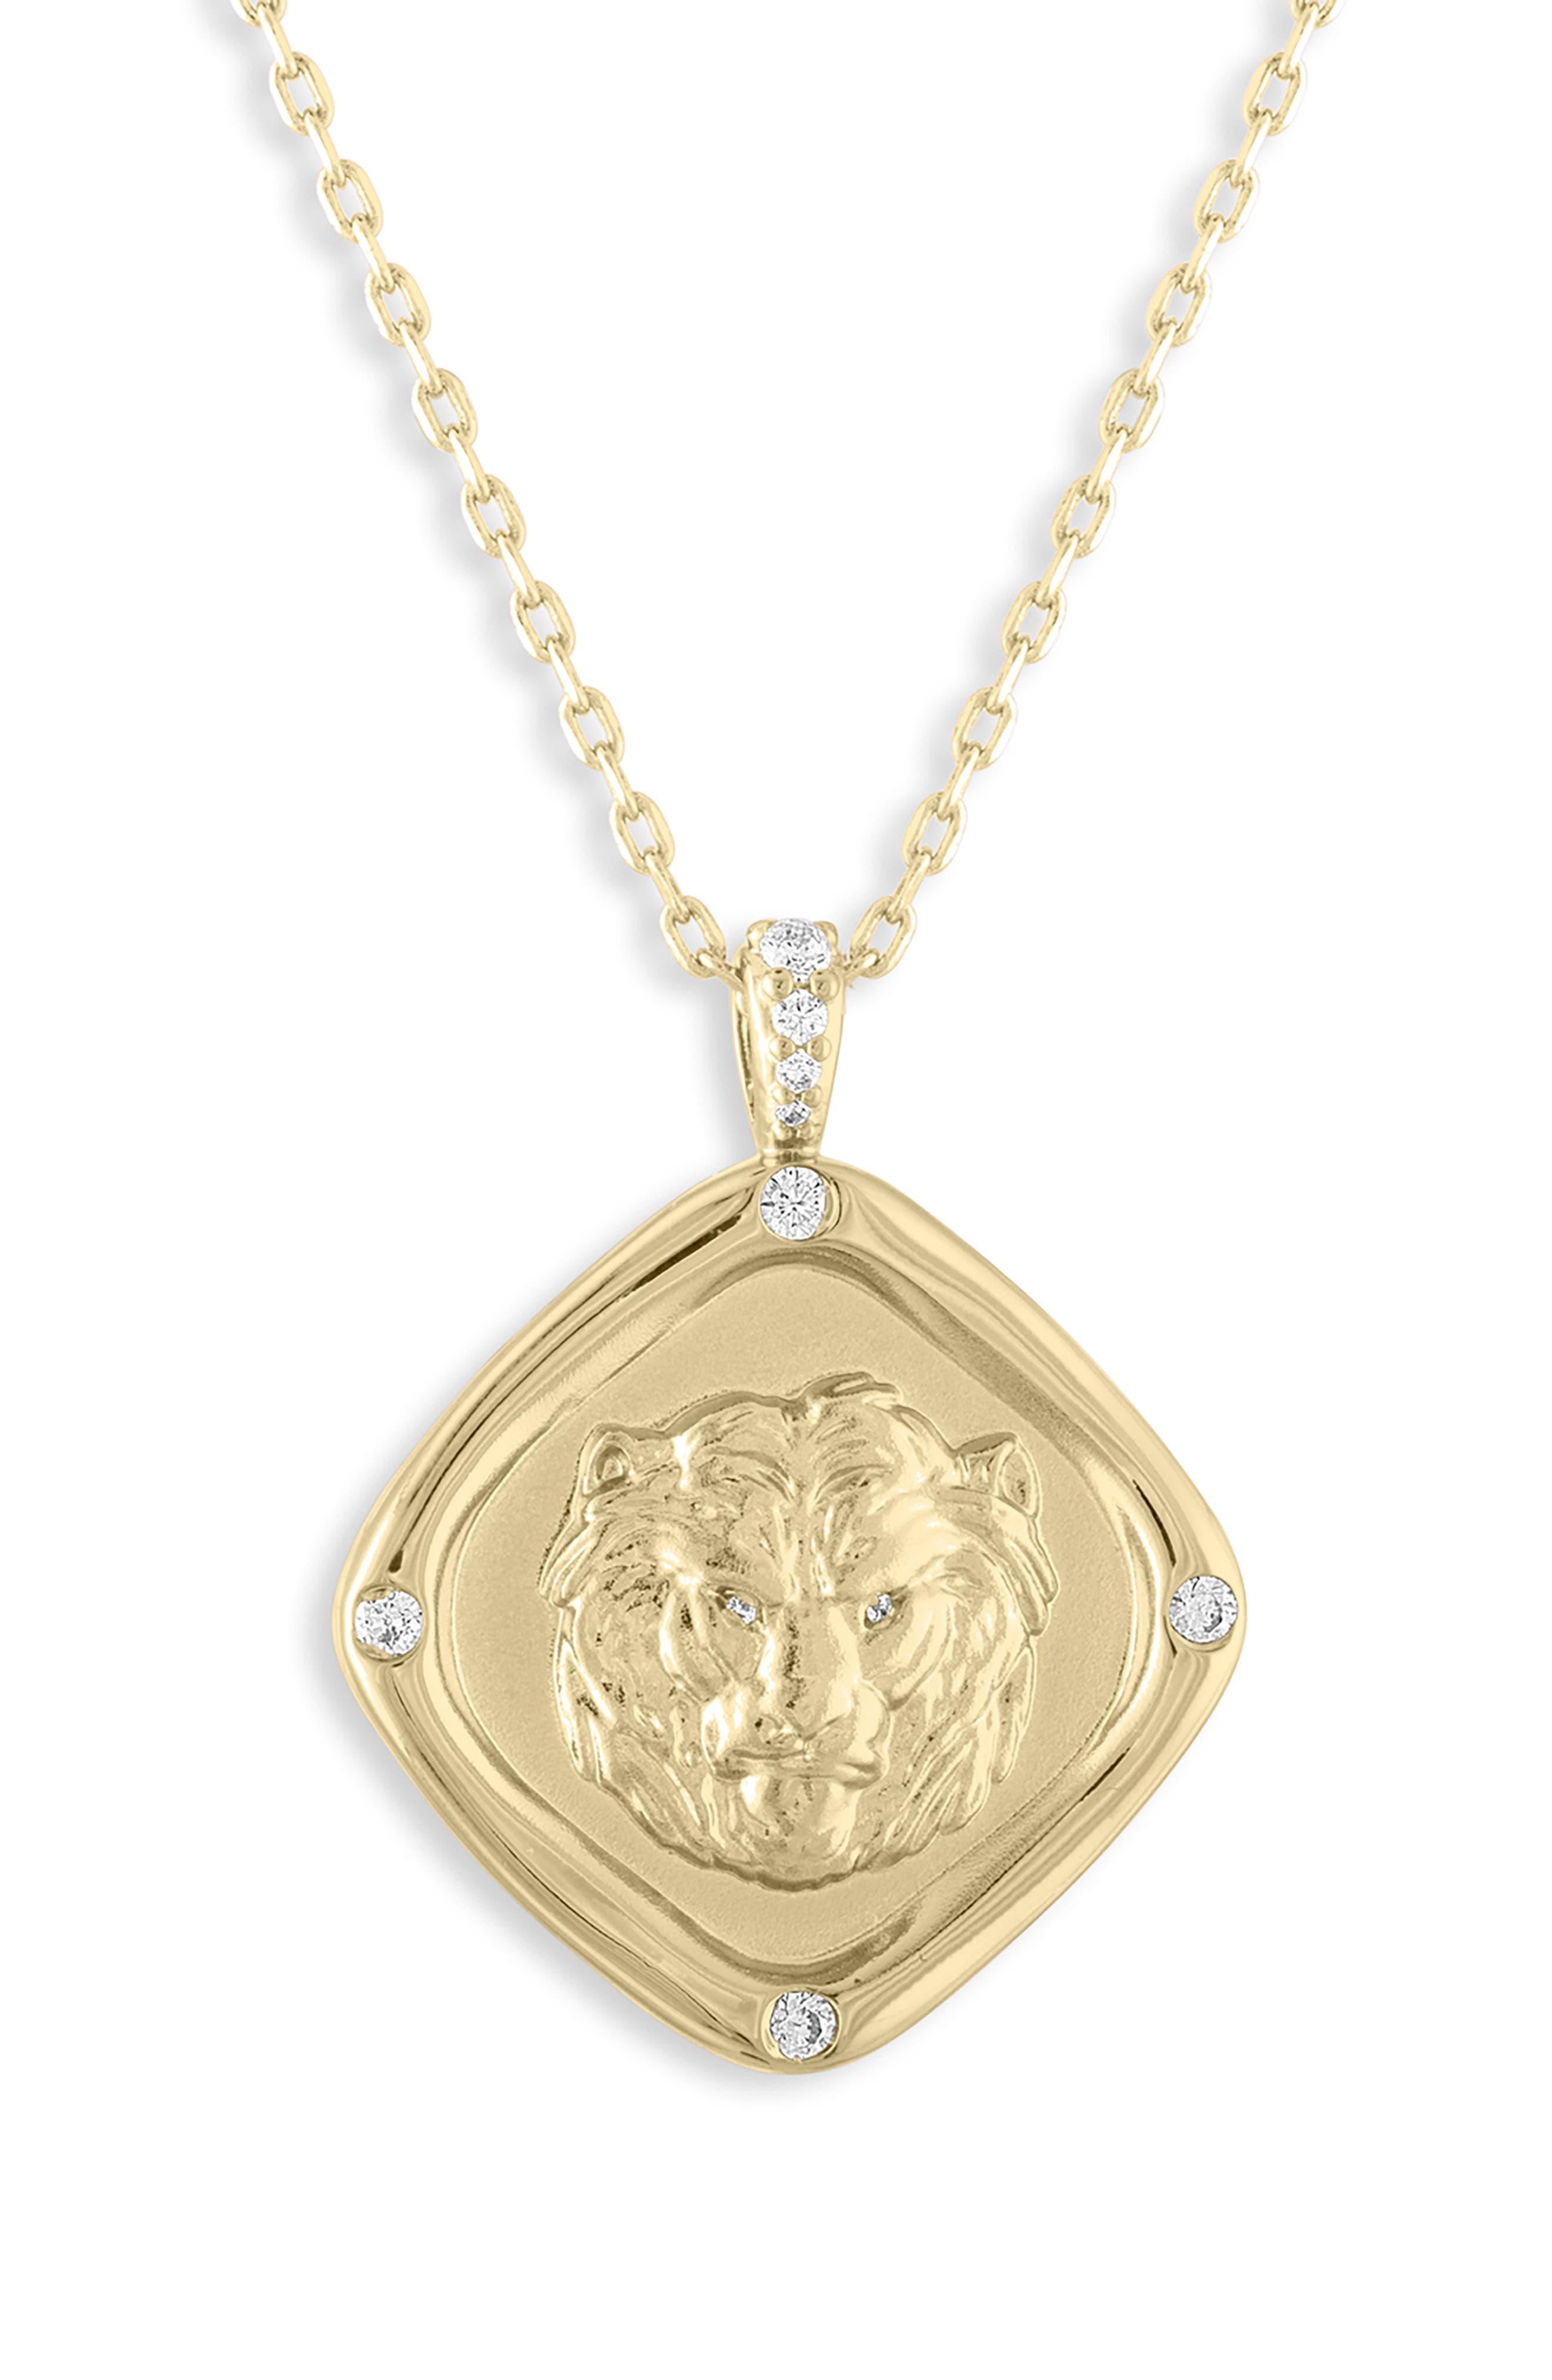 LULU DK Invincible Diamond Shaped Pendant Necklace in Gold